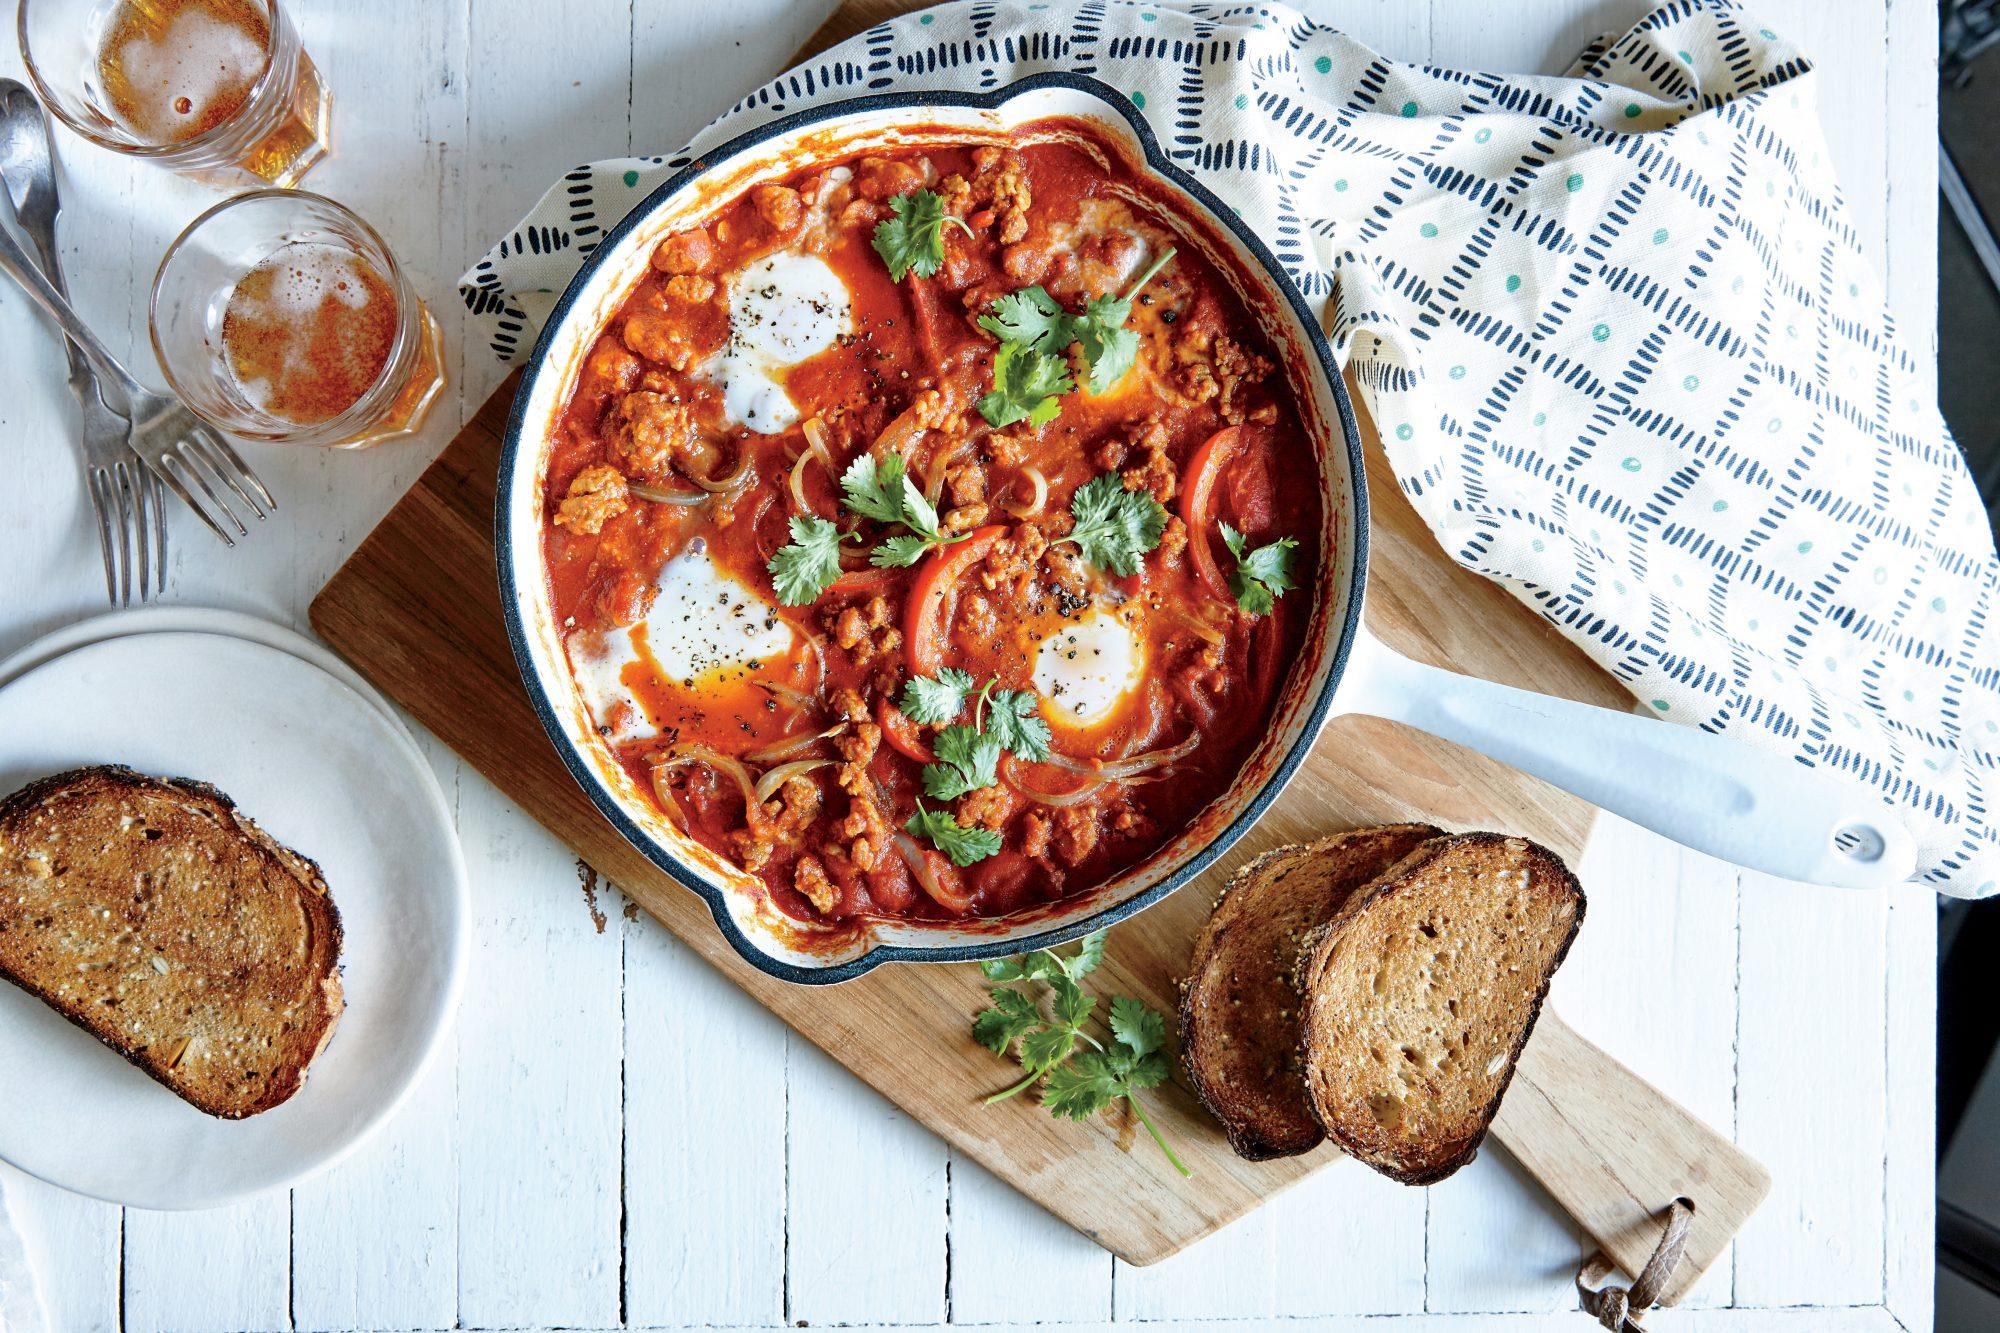 Saucy Chorizo and Egg Skillet